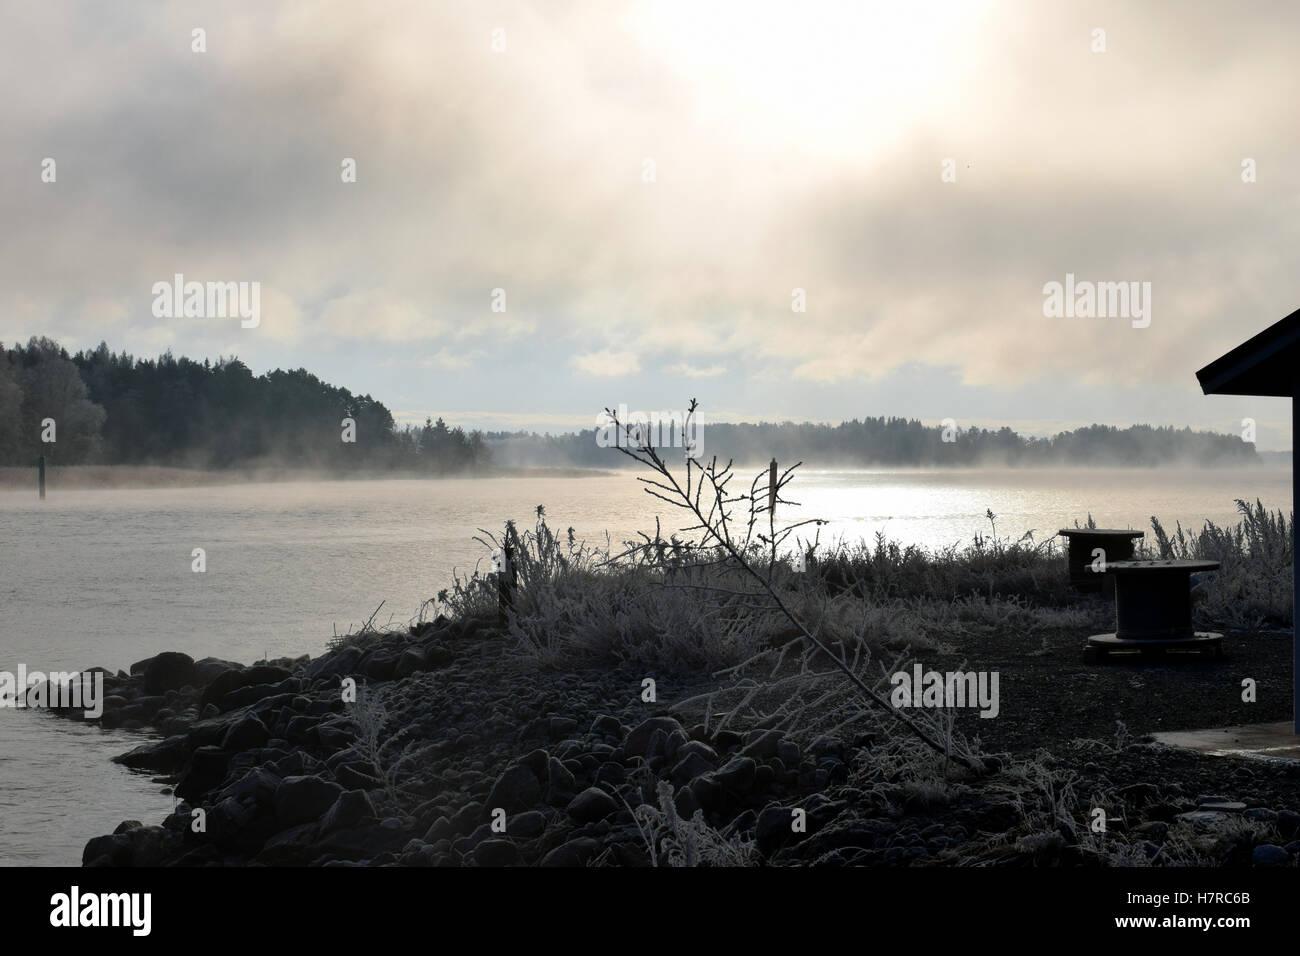 Ice fog rises from the sea on Turku archipelago, Finland. Stock Photo